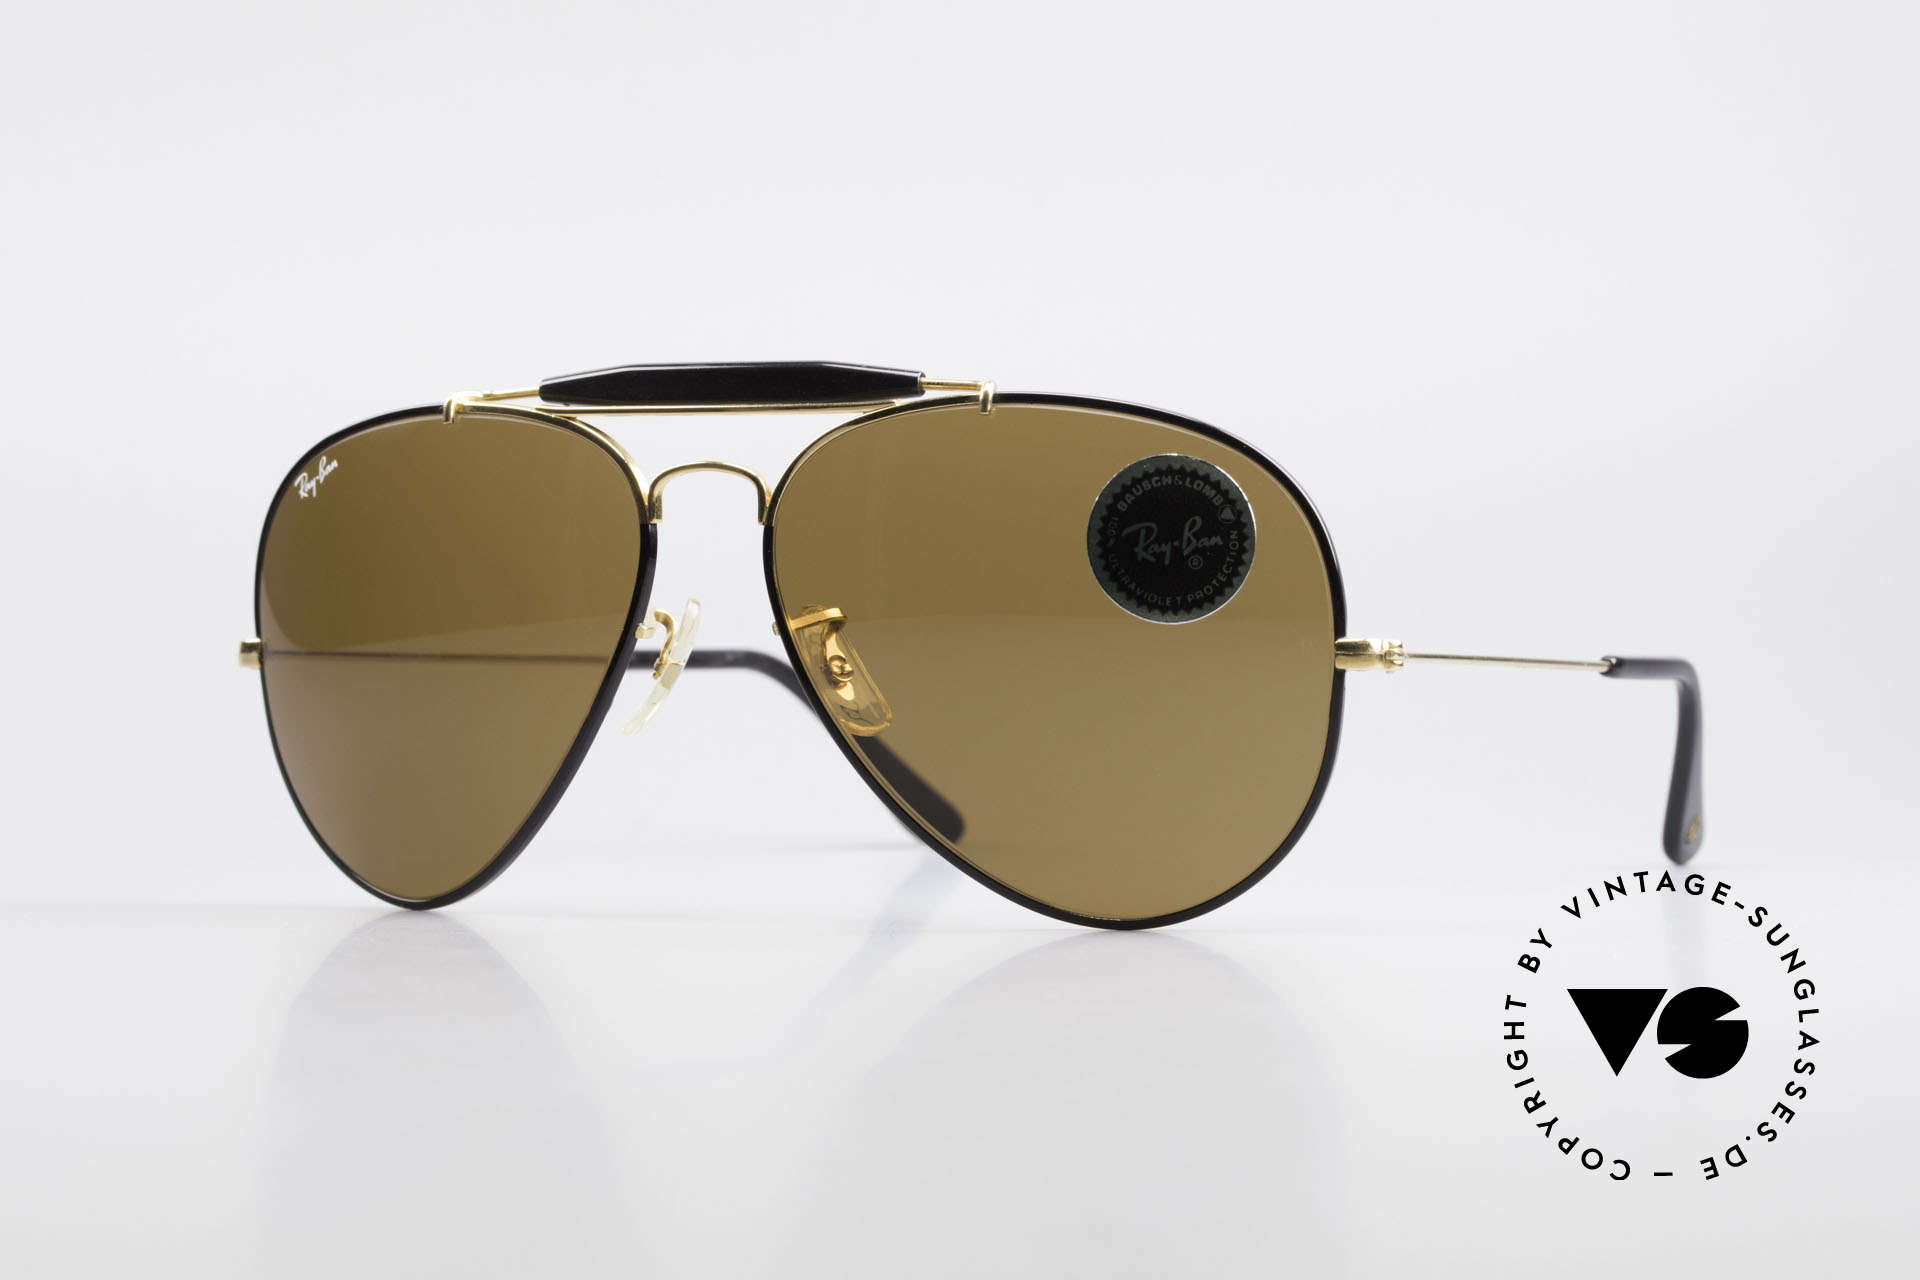 Ray Ban Outdoorsman II Precious Metals USA Ray-Ban, costly vintage RAY-BAN B&L aviator sunglasses, Made for Men